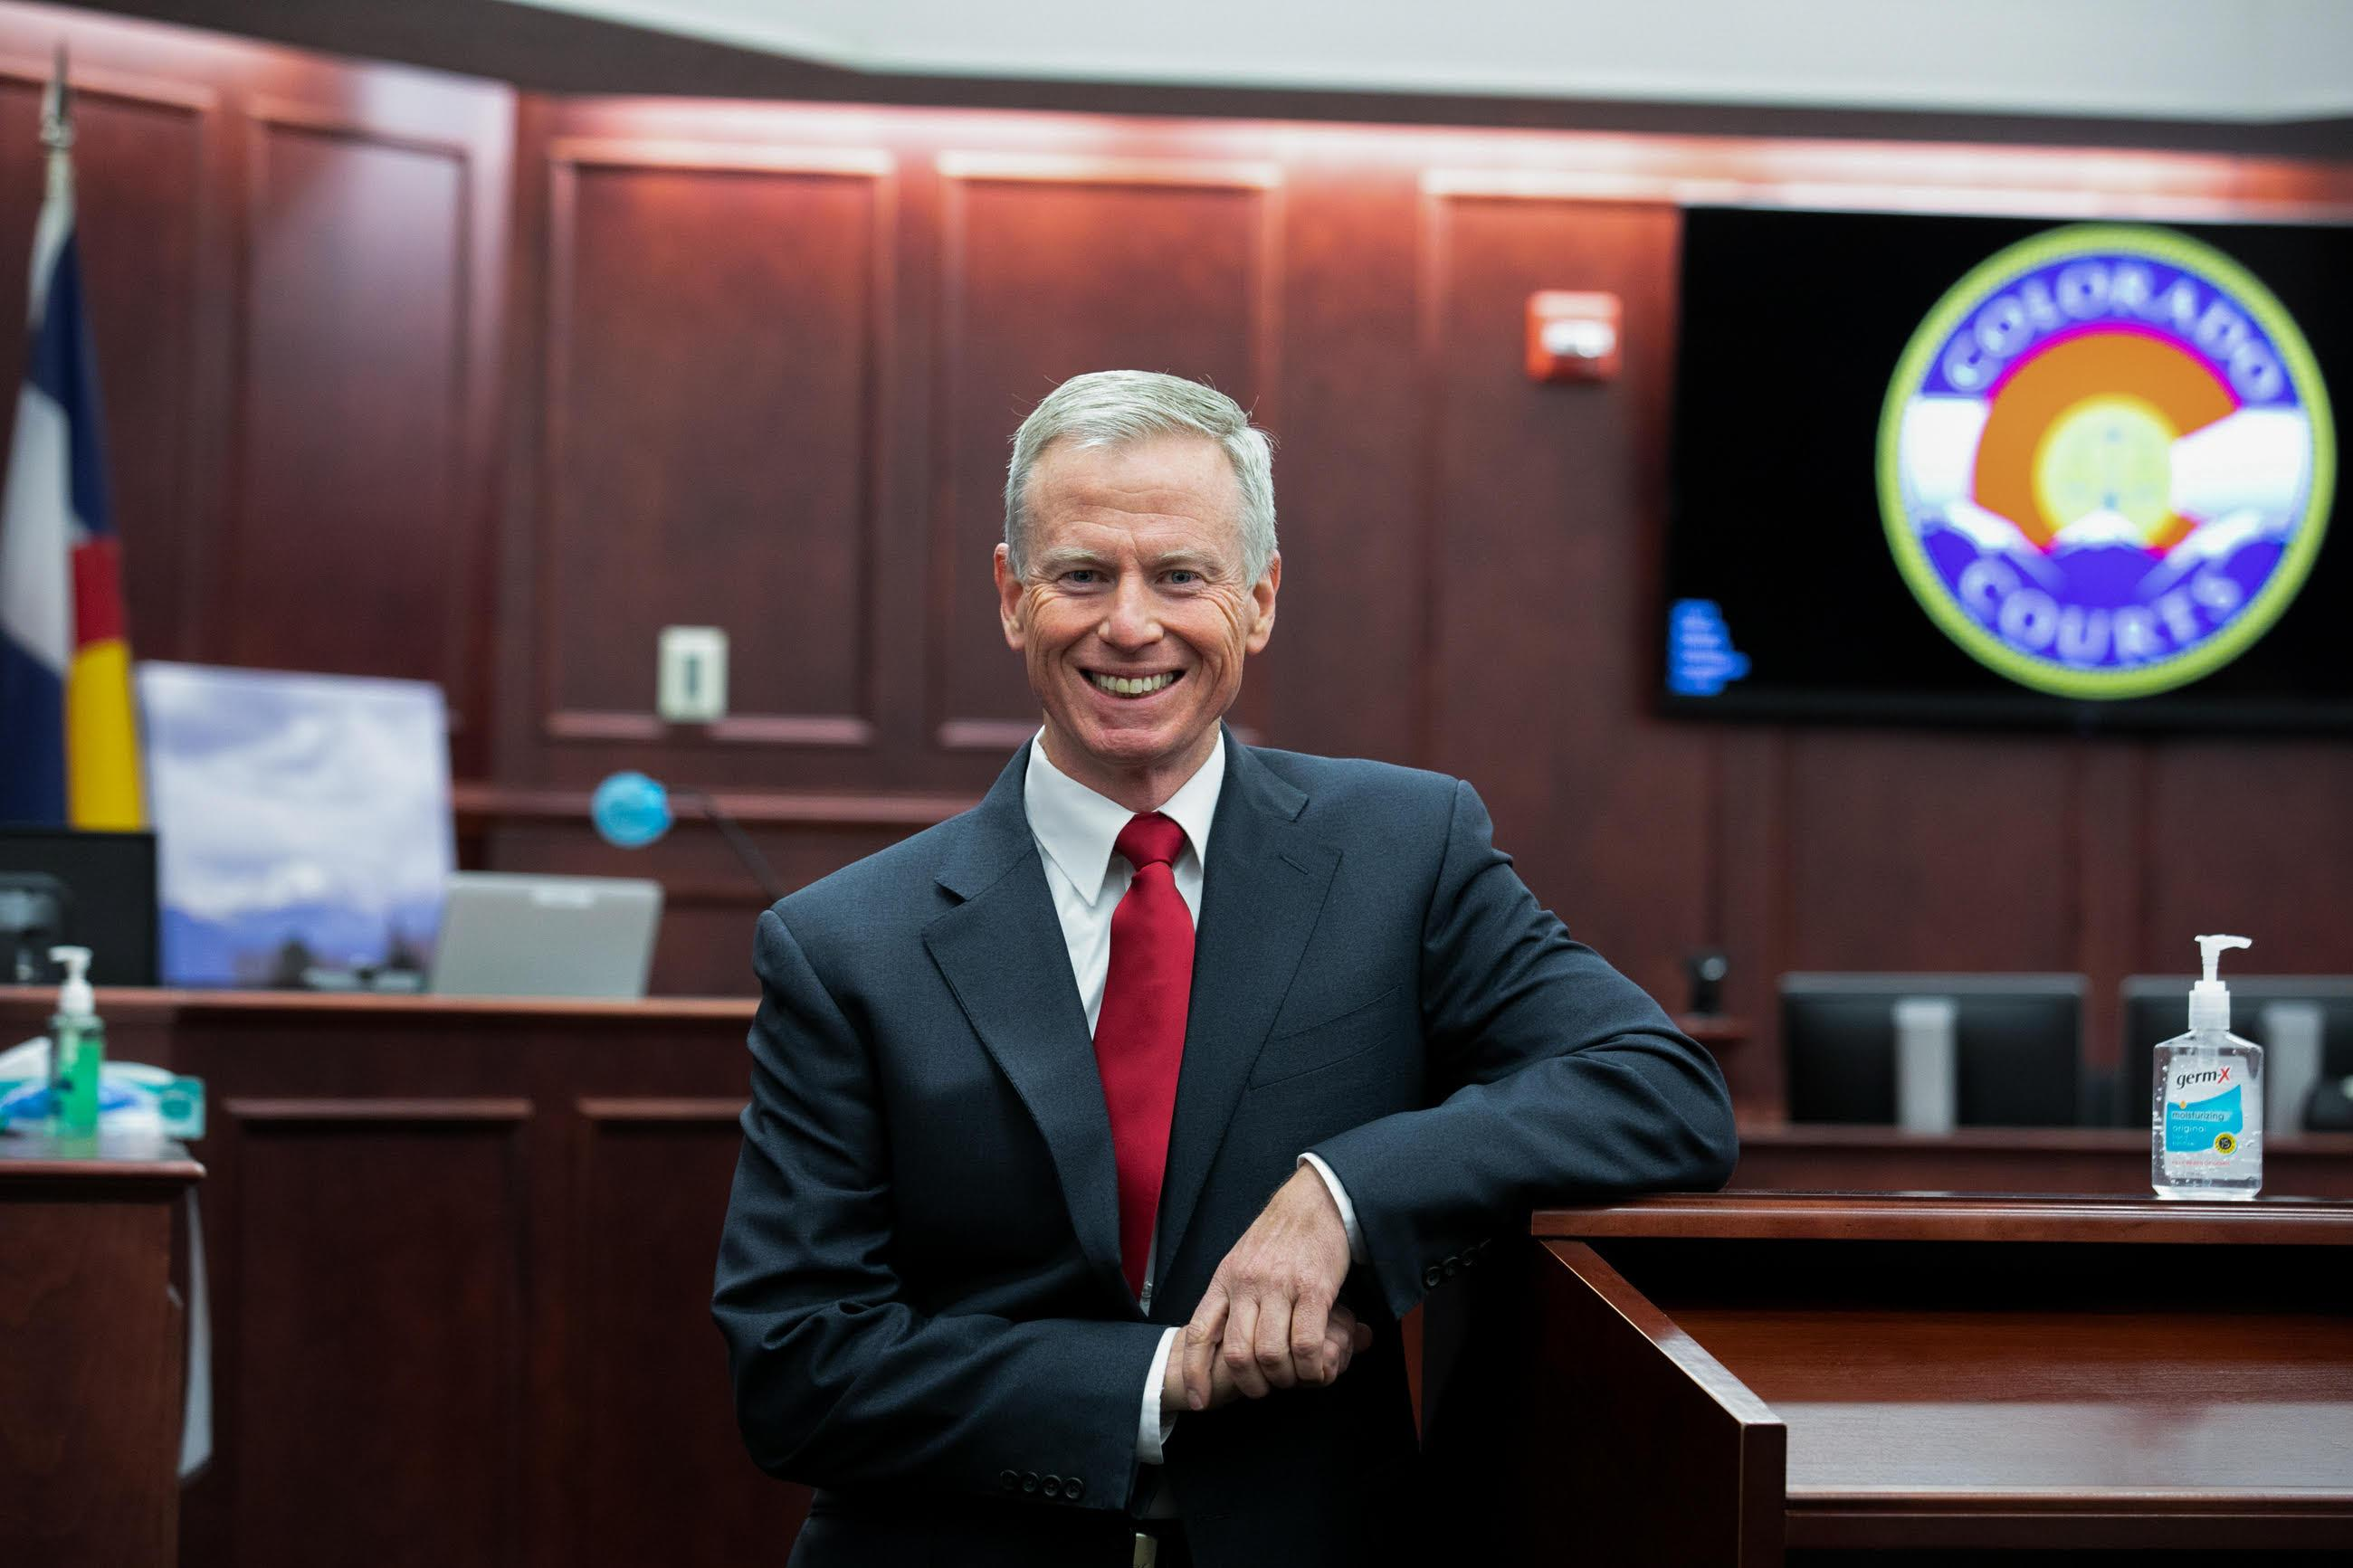 George Brauchler was district attorney prosecuting Aurora, Colorado, mass shooting